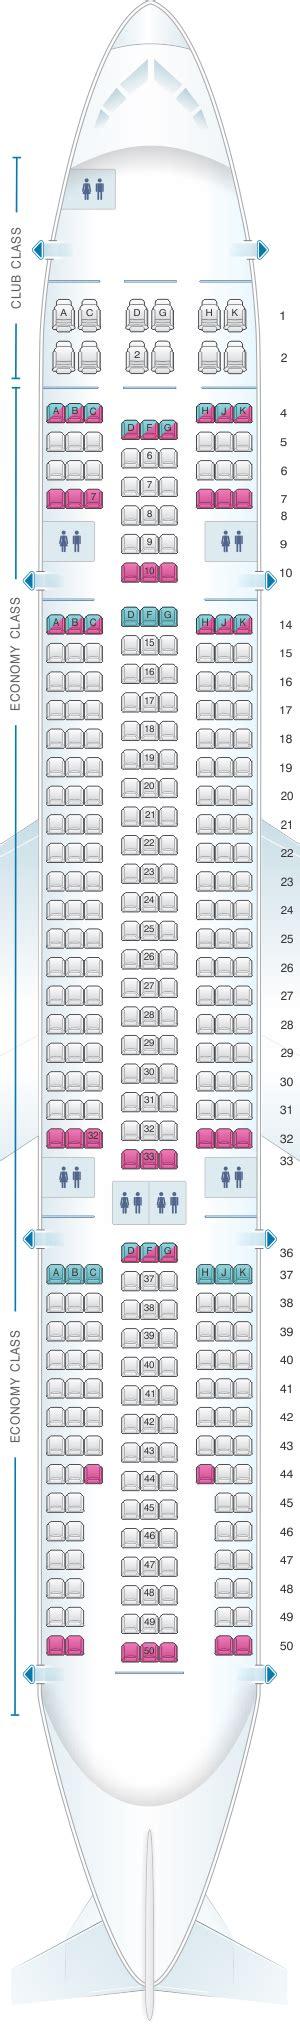 air transat reserver siege plan de cabine air transat airbus a330 200 seatmaestro fr